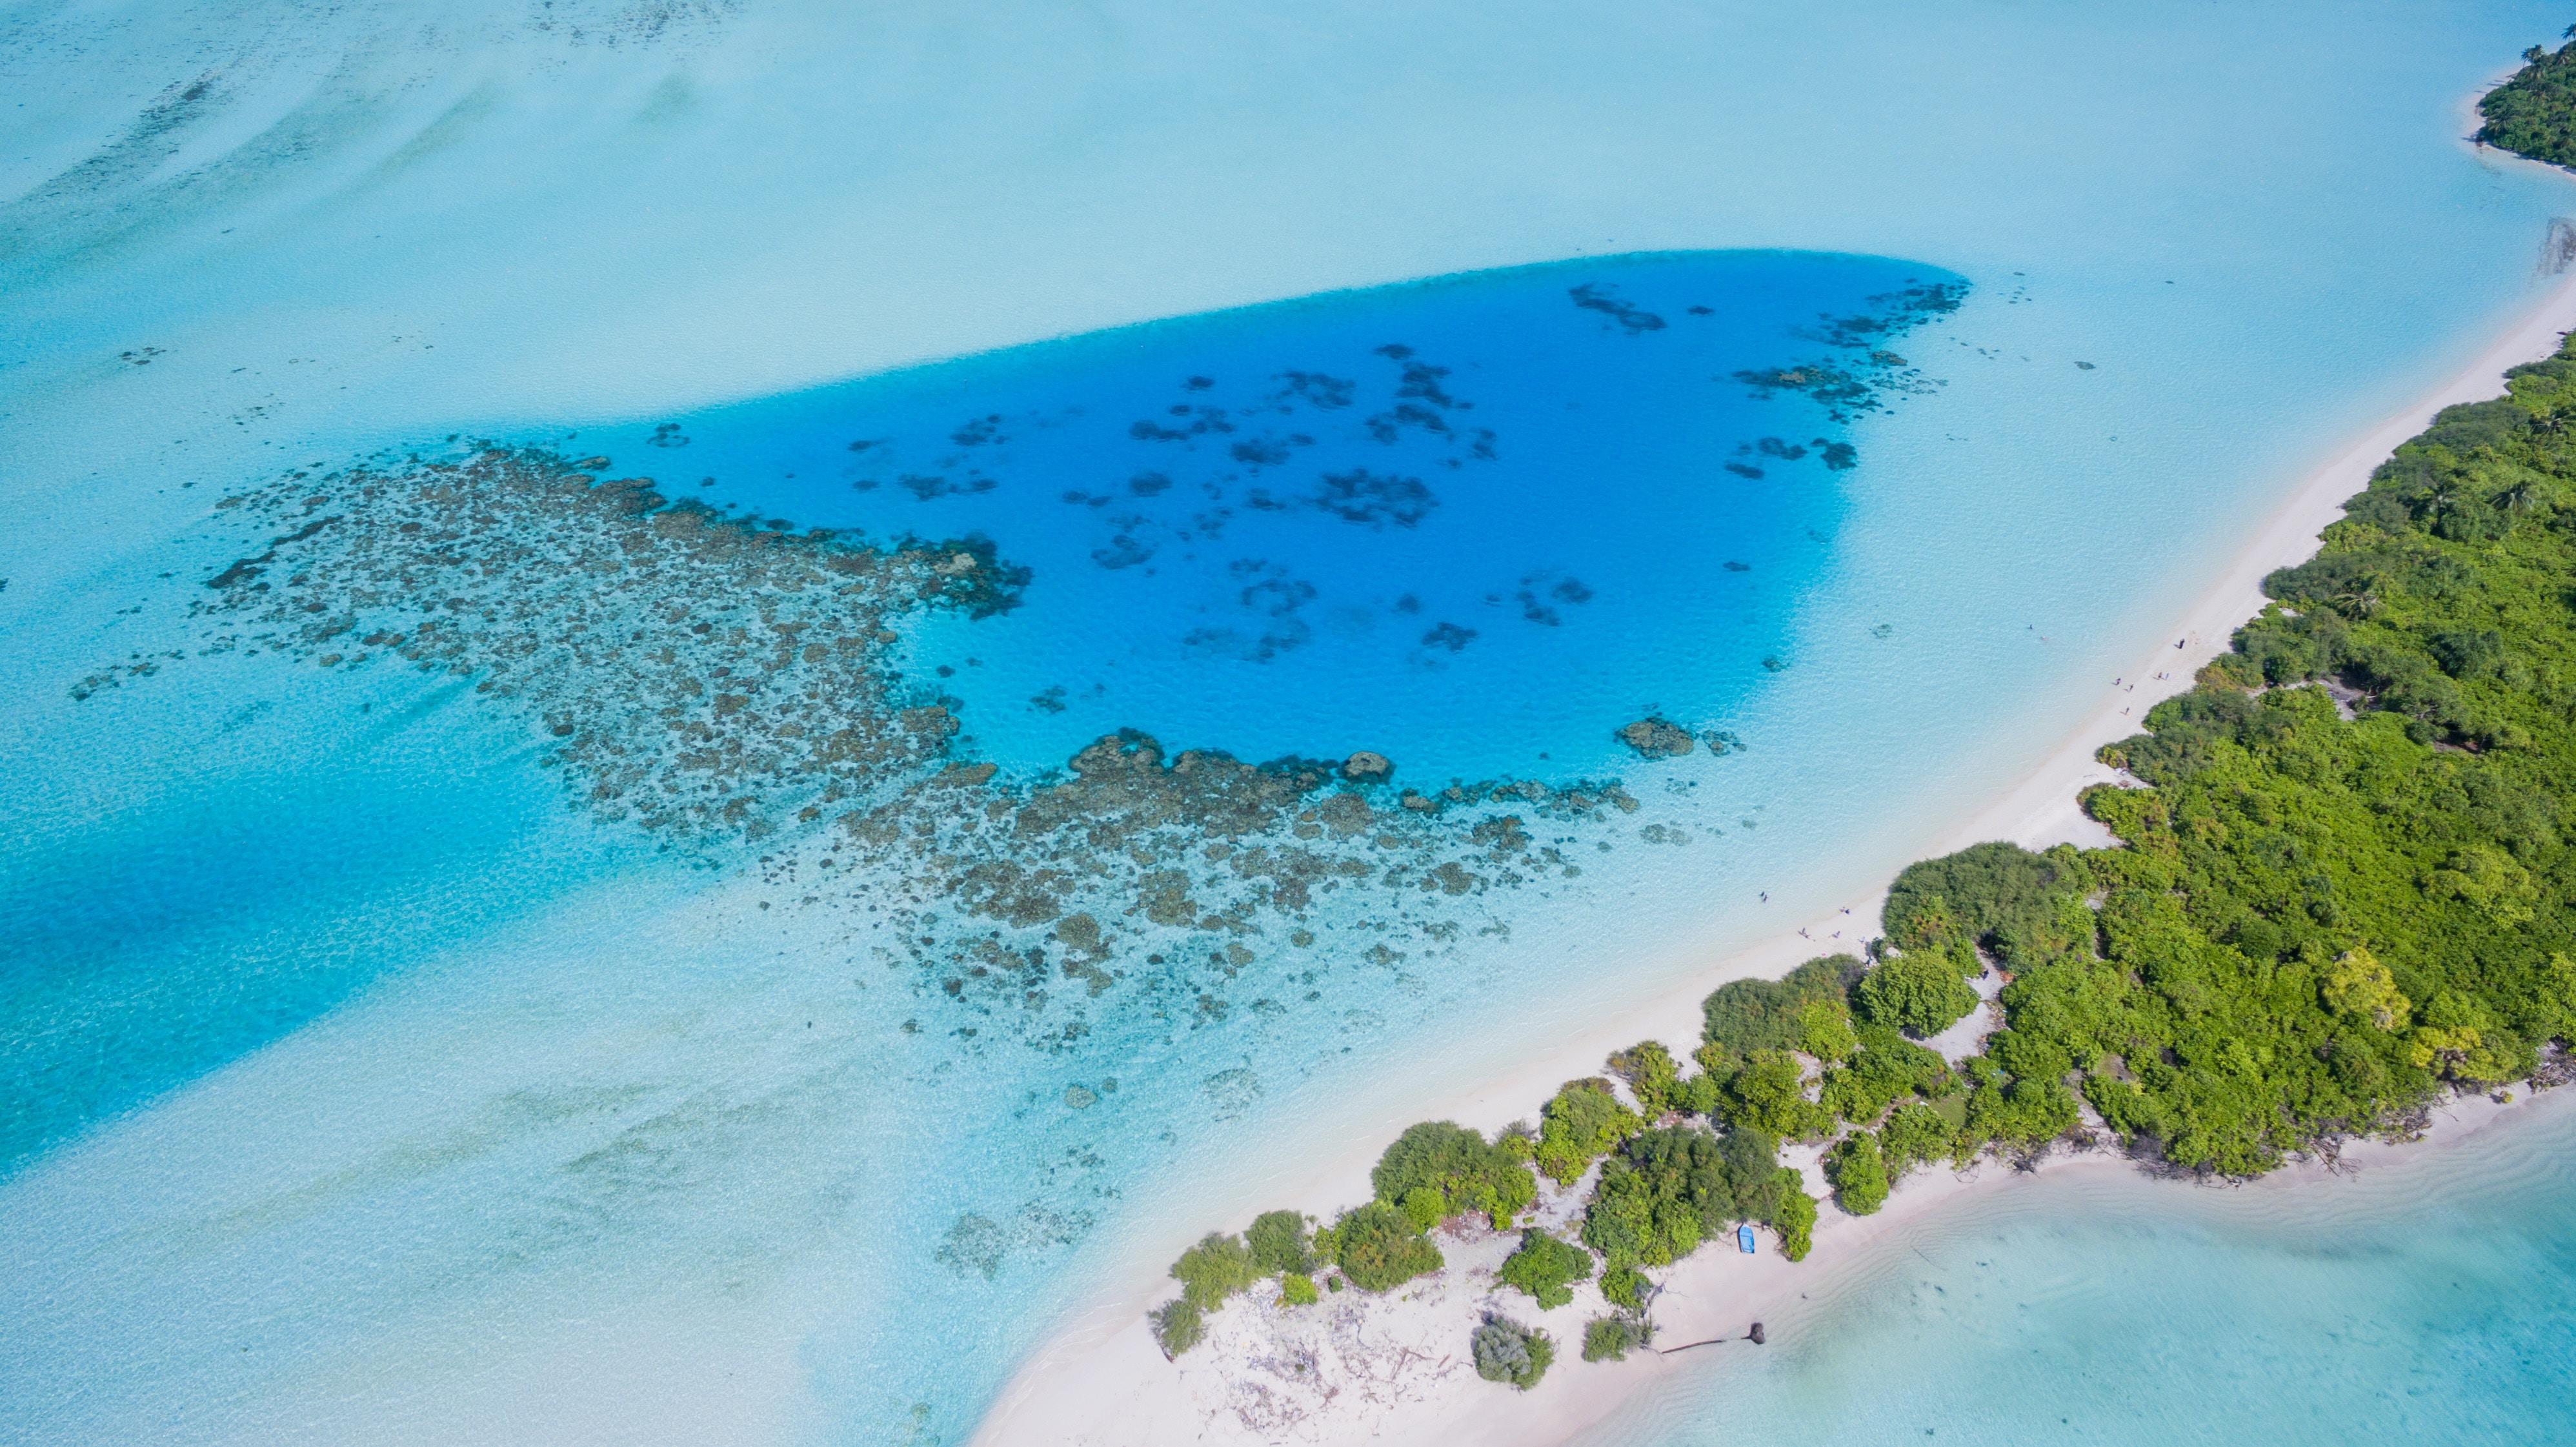 A drone shot of a tropical island in Maldives